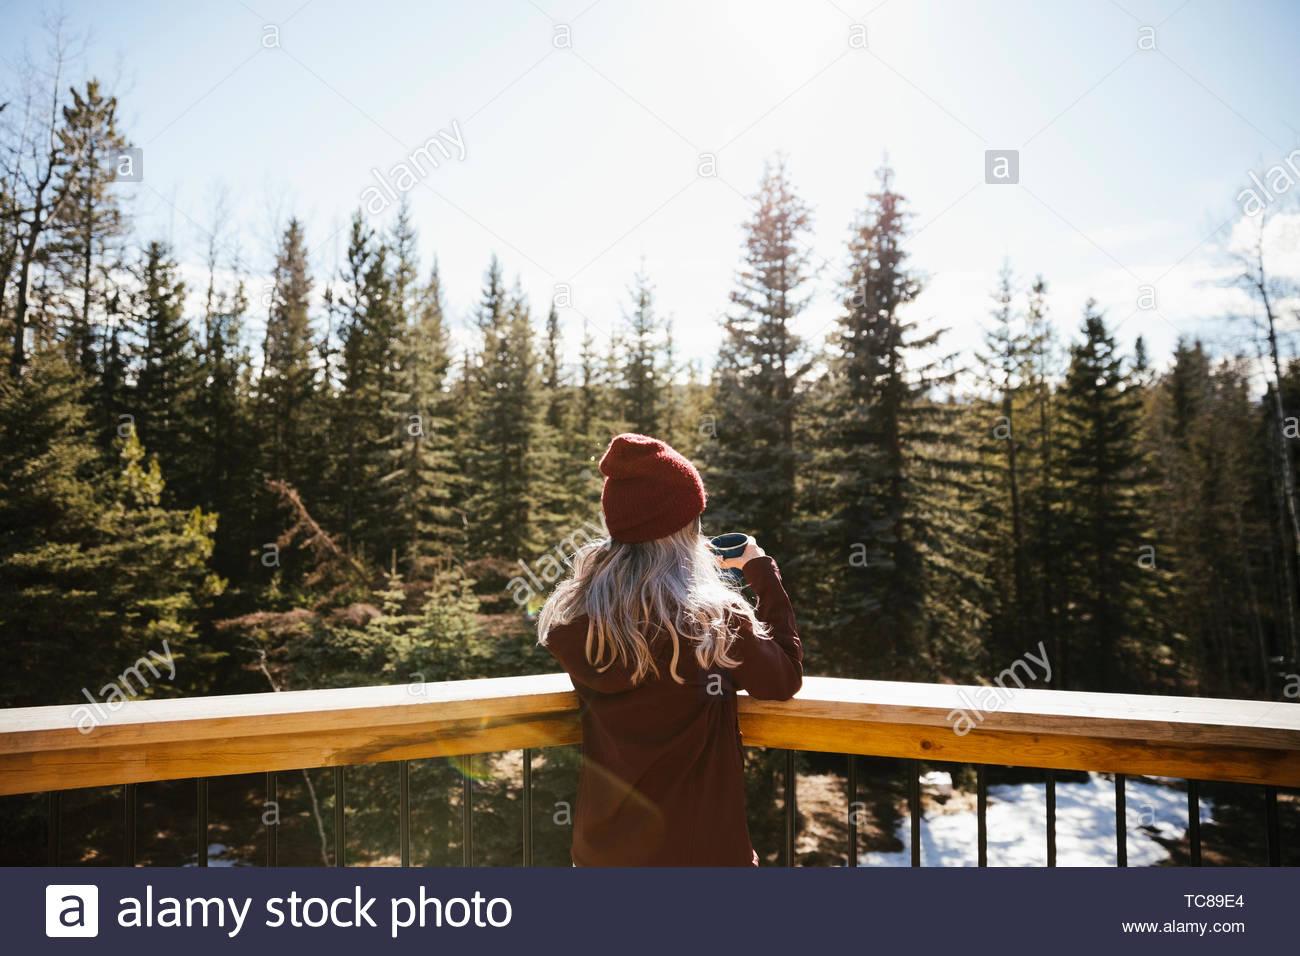 Woman drinking coffee on sunny balcony overlooking woods - Stock Image